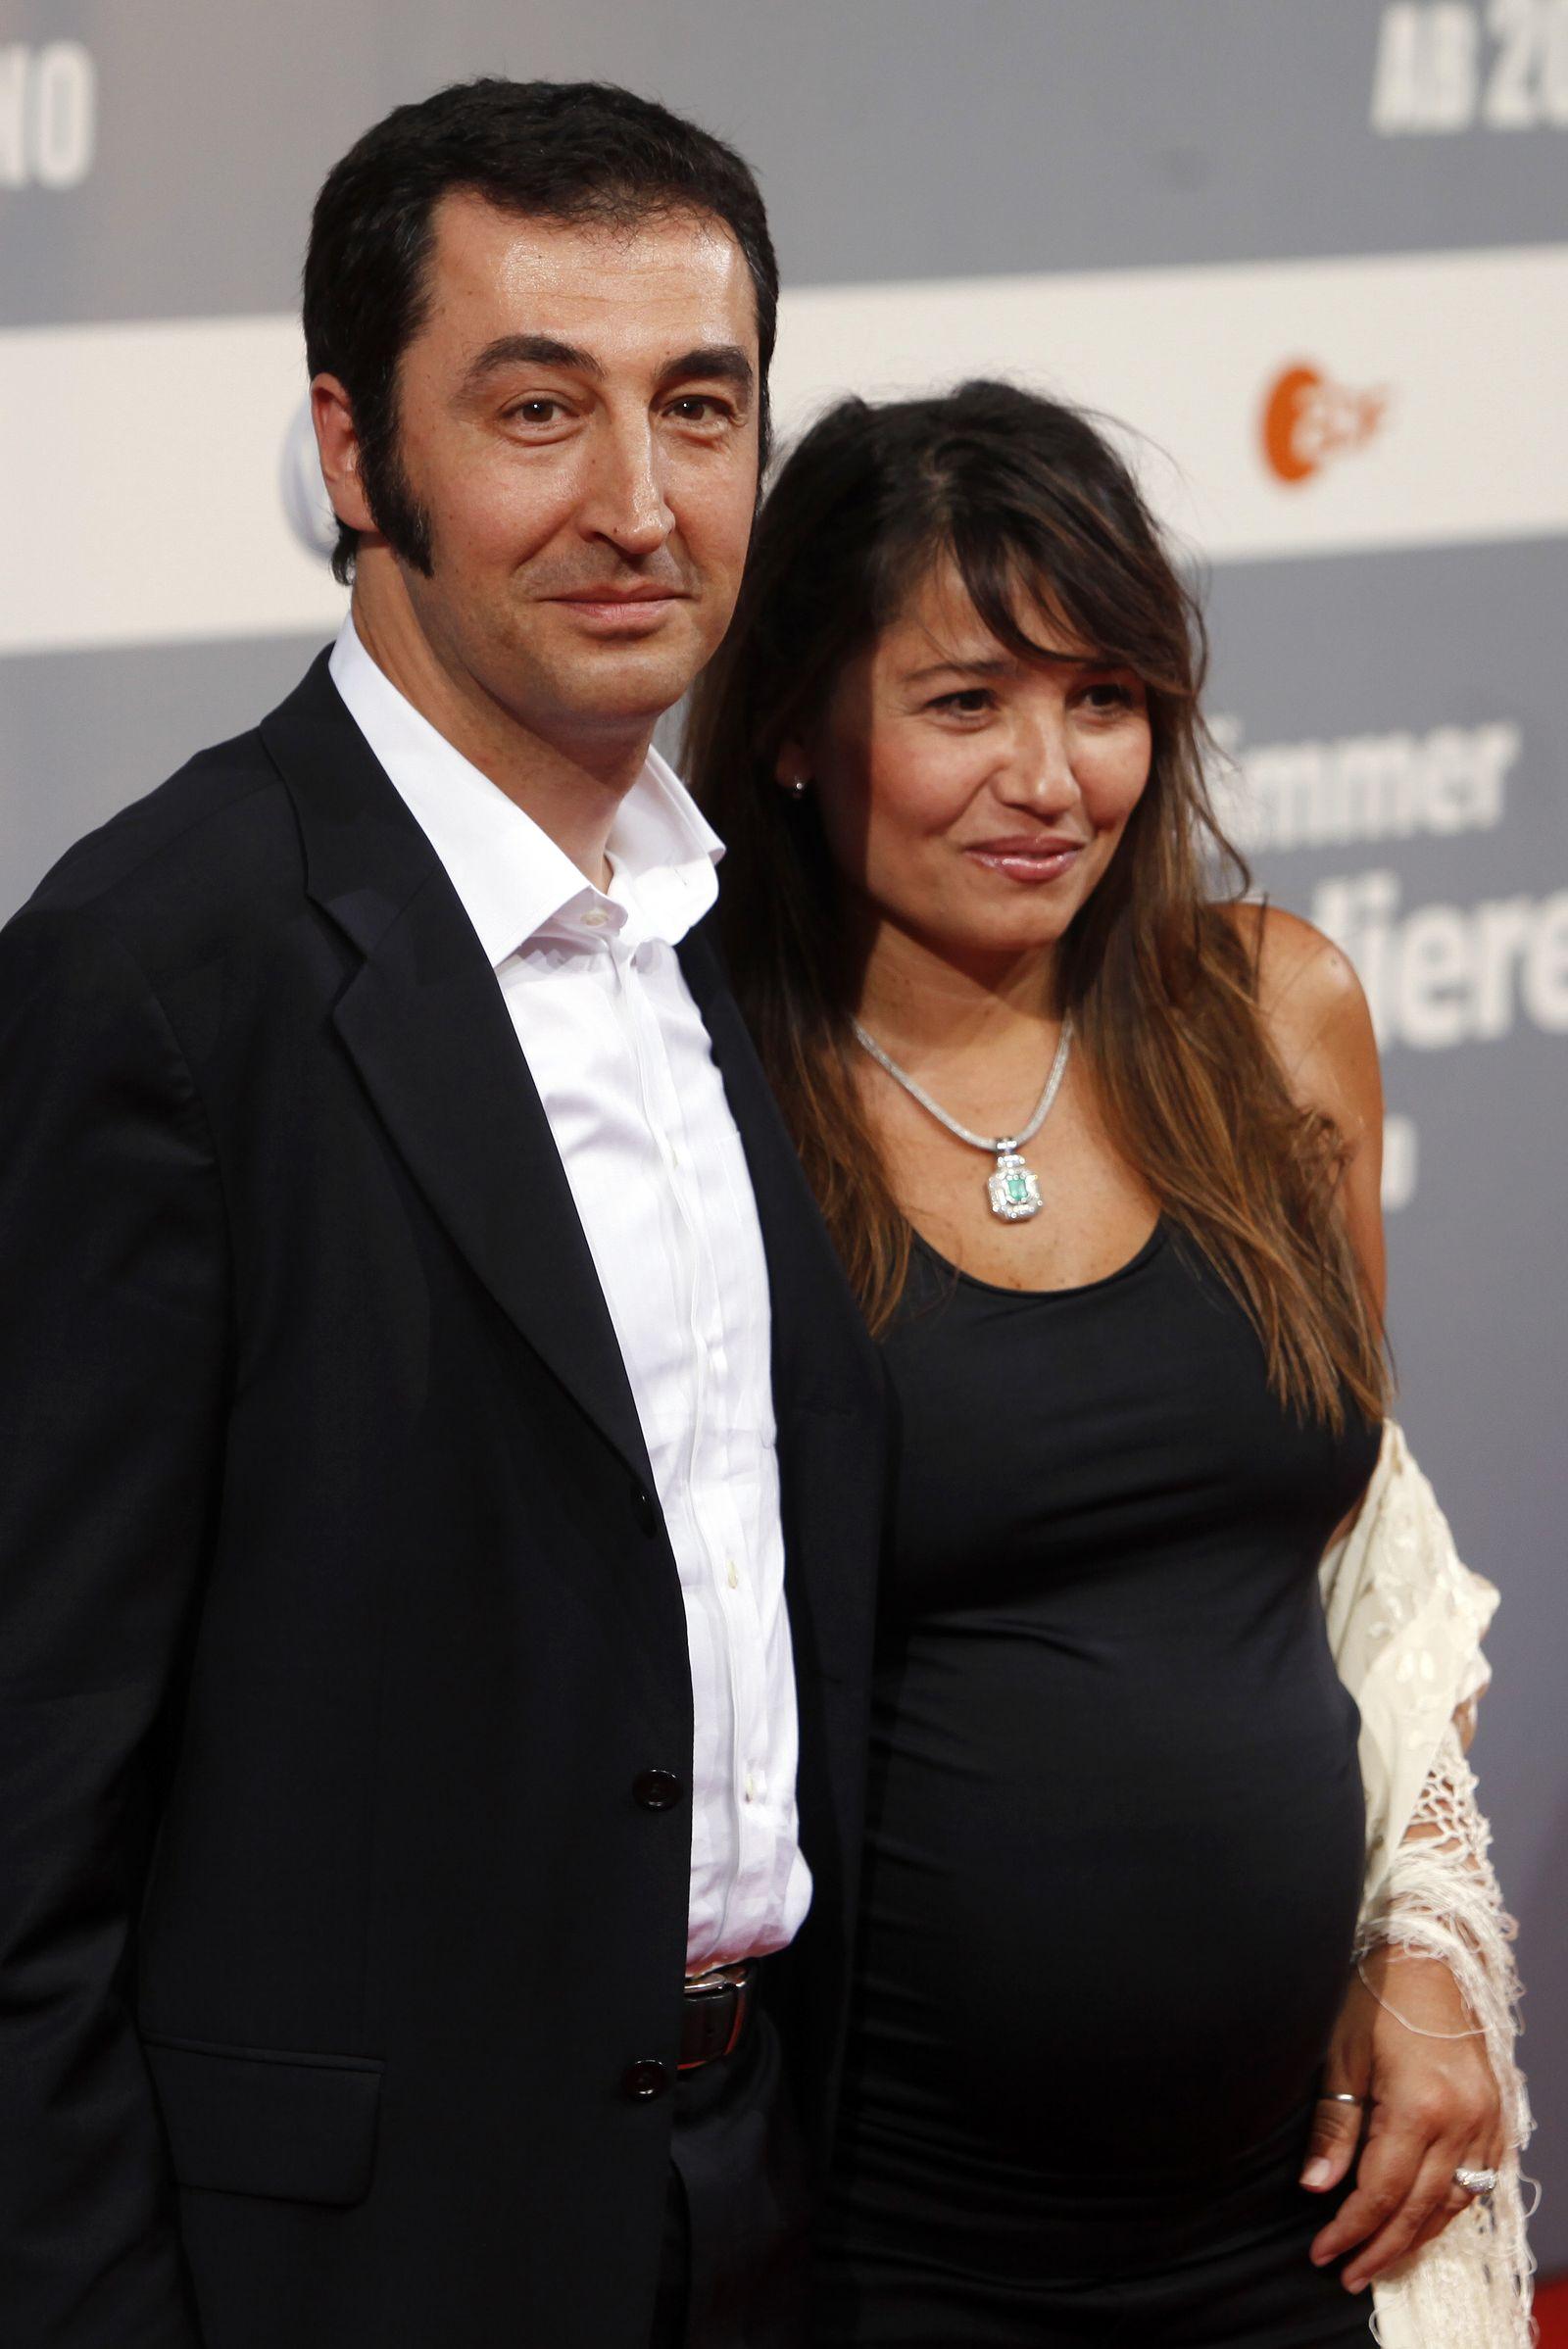 Özdemir / Ehefrau Pia / Kinopremiere